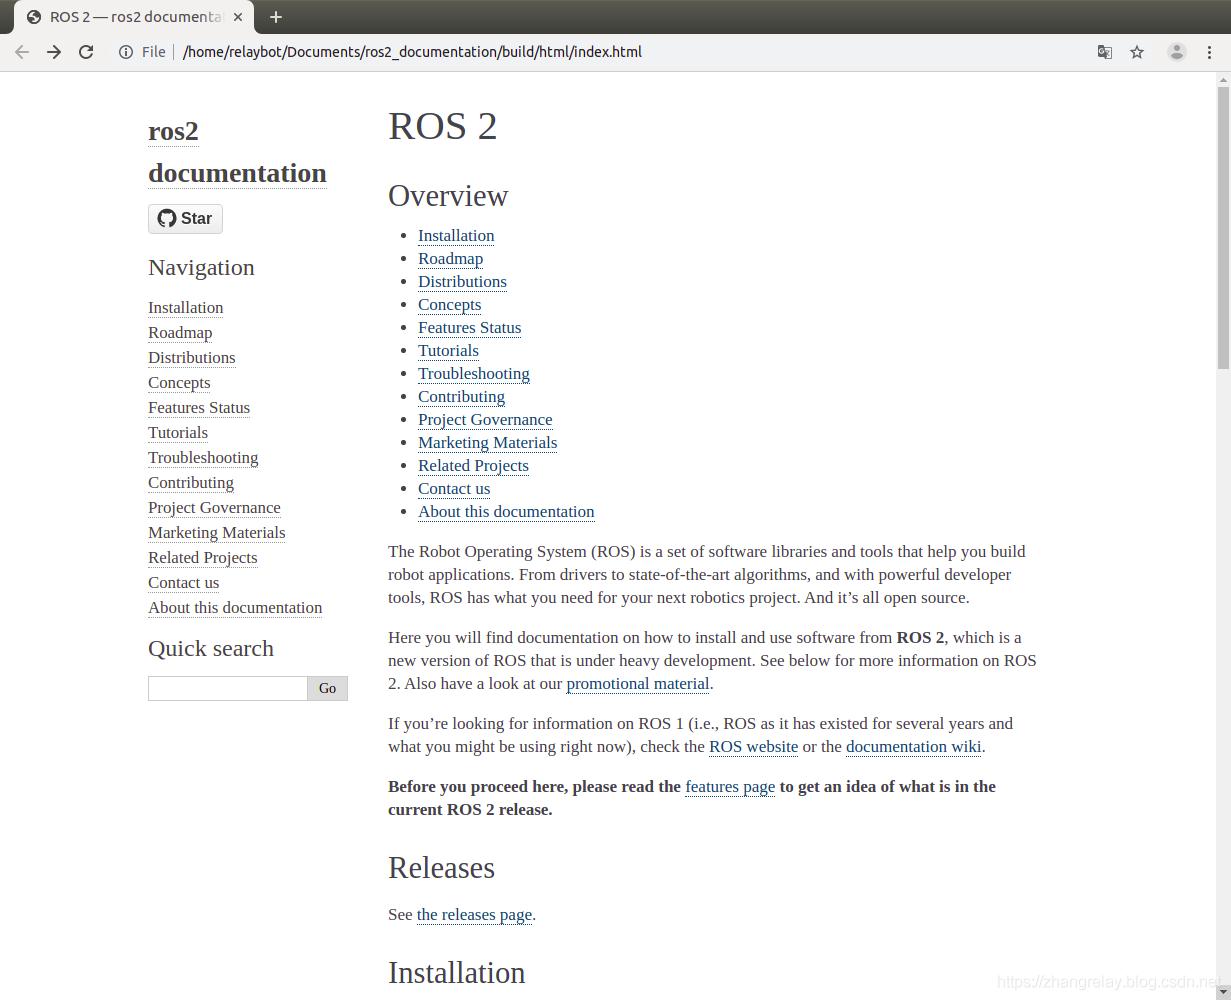 ROS2教程文档使用说明与为什么选择ROS2? - zhangrelay的专栏